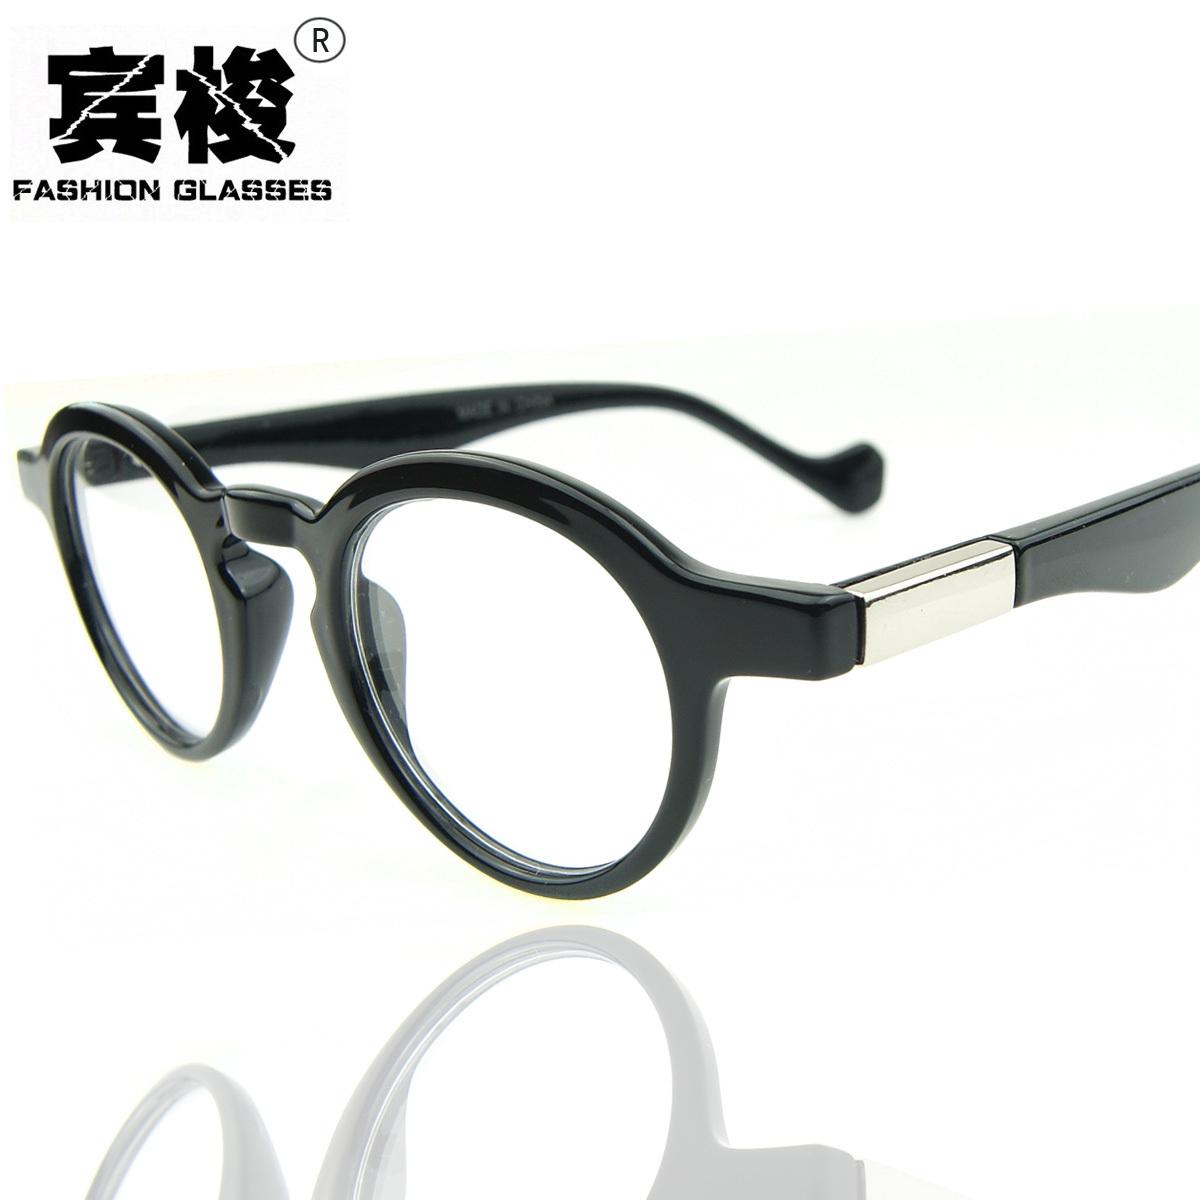 New arrival 2015glasses frame male female vintage circle myopia eyeglasses frame round box eye box non-mainstream(China (Mainland))